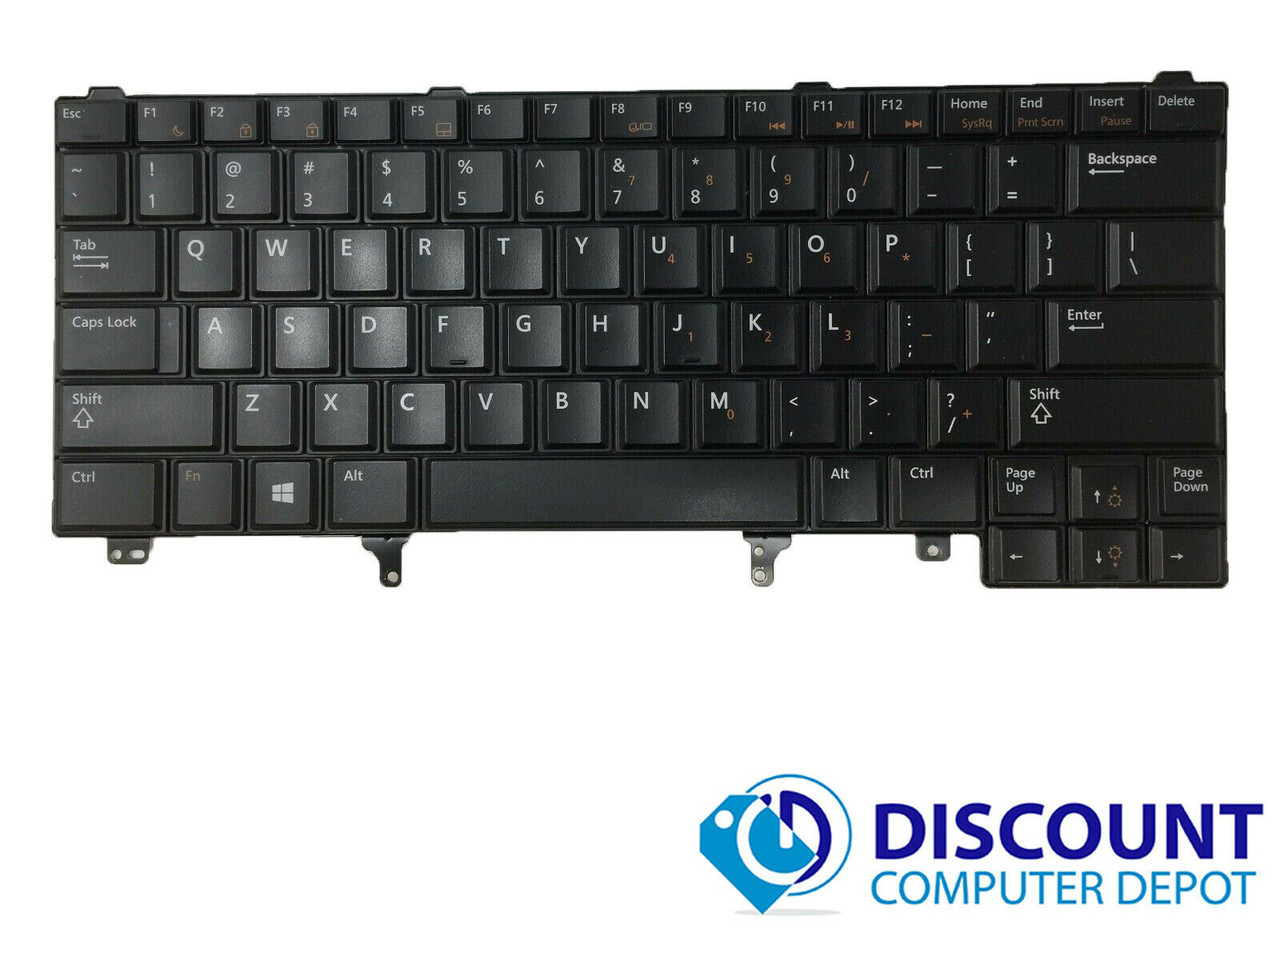 NSK-DVCUC Dell Latitude E5420 Laptop Keyboard DP//N 0PD7Y0 Model